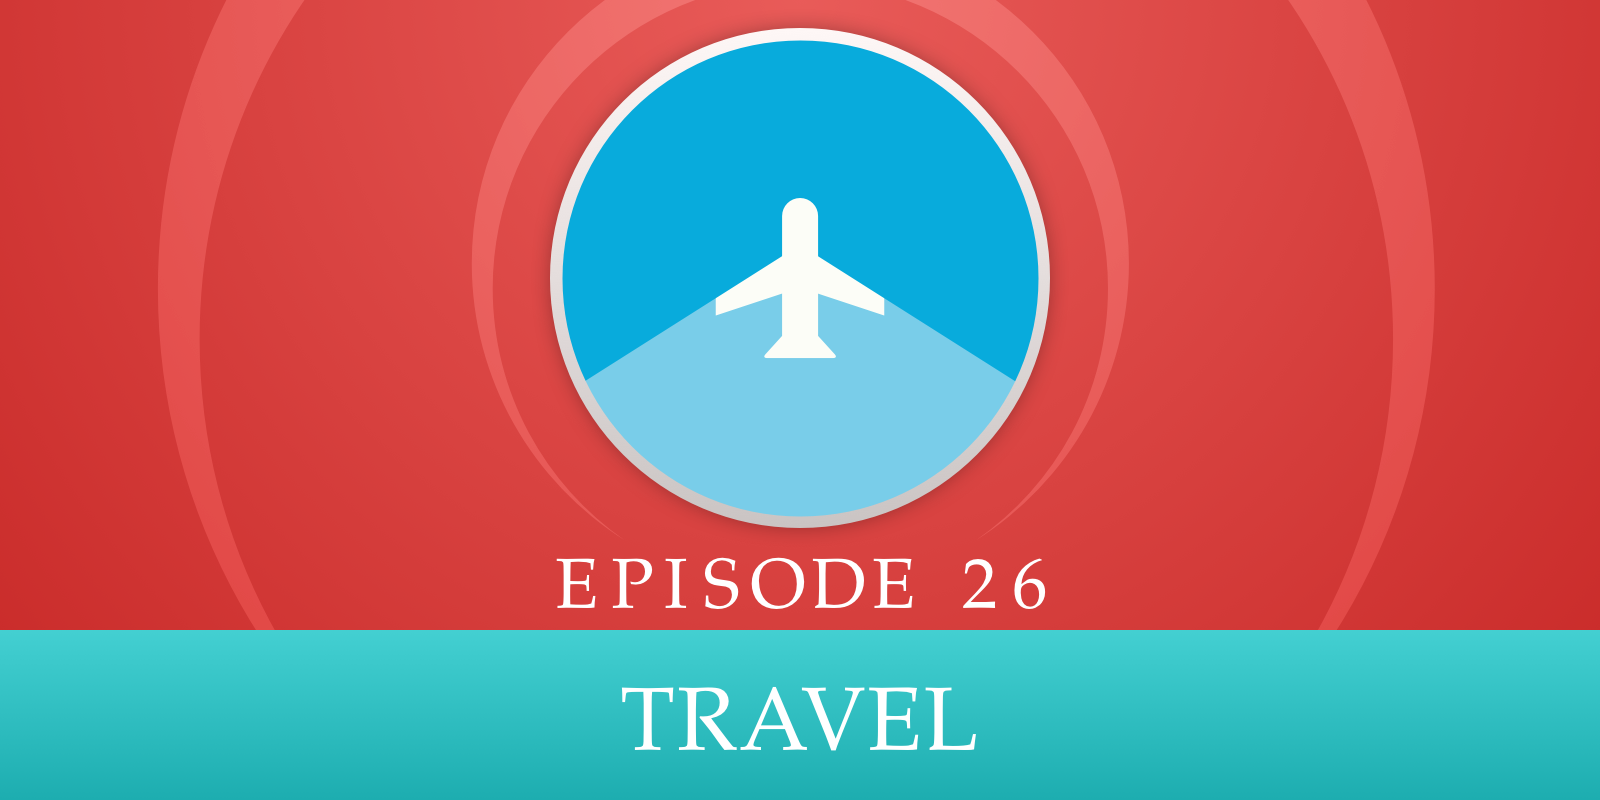 Episode 26: Travel